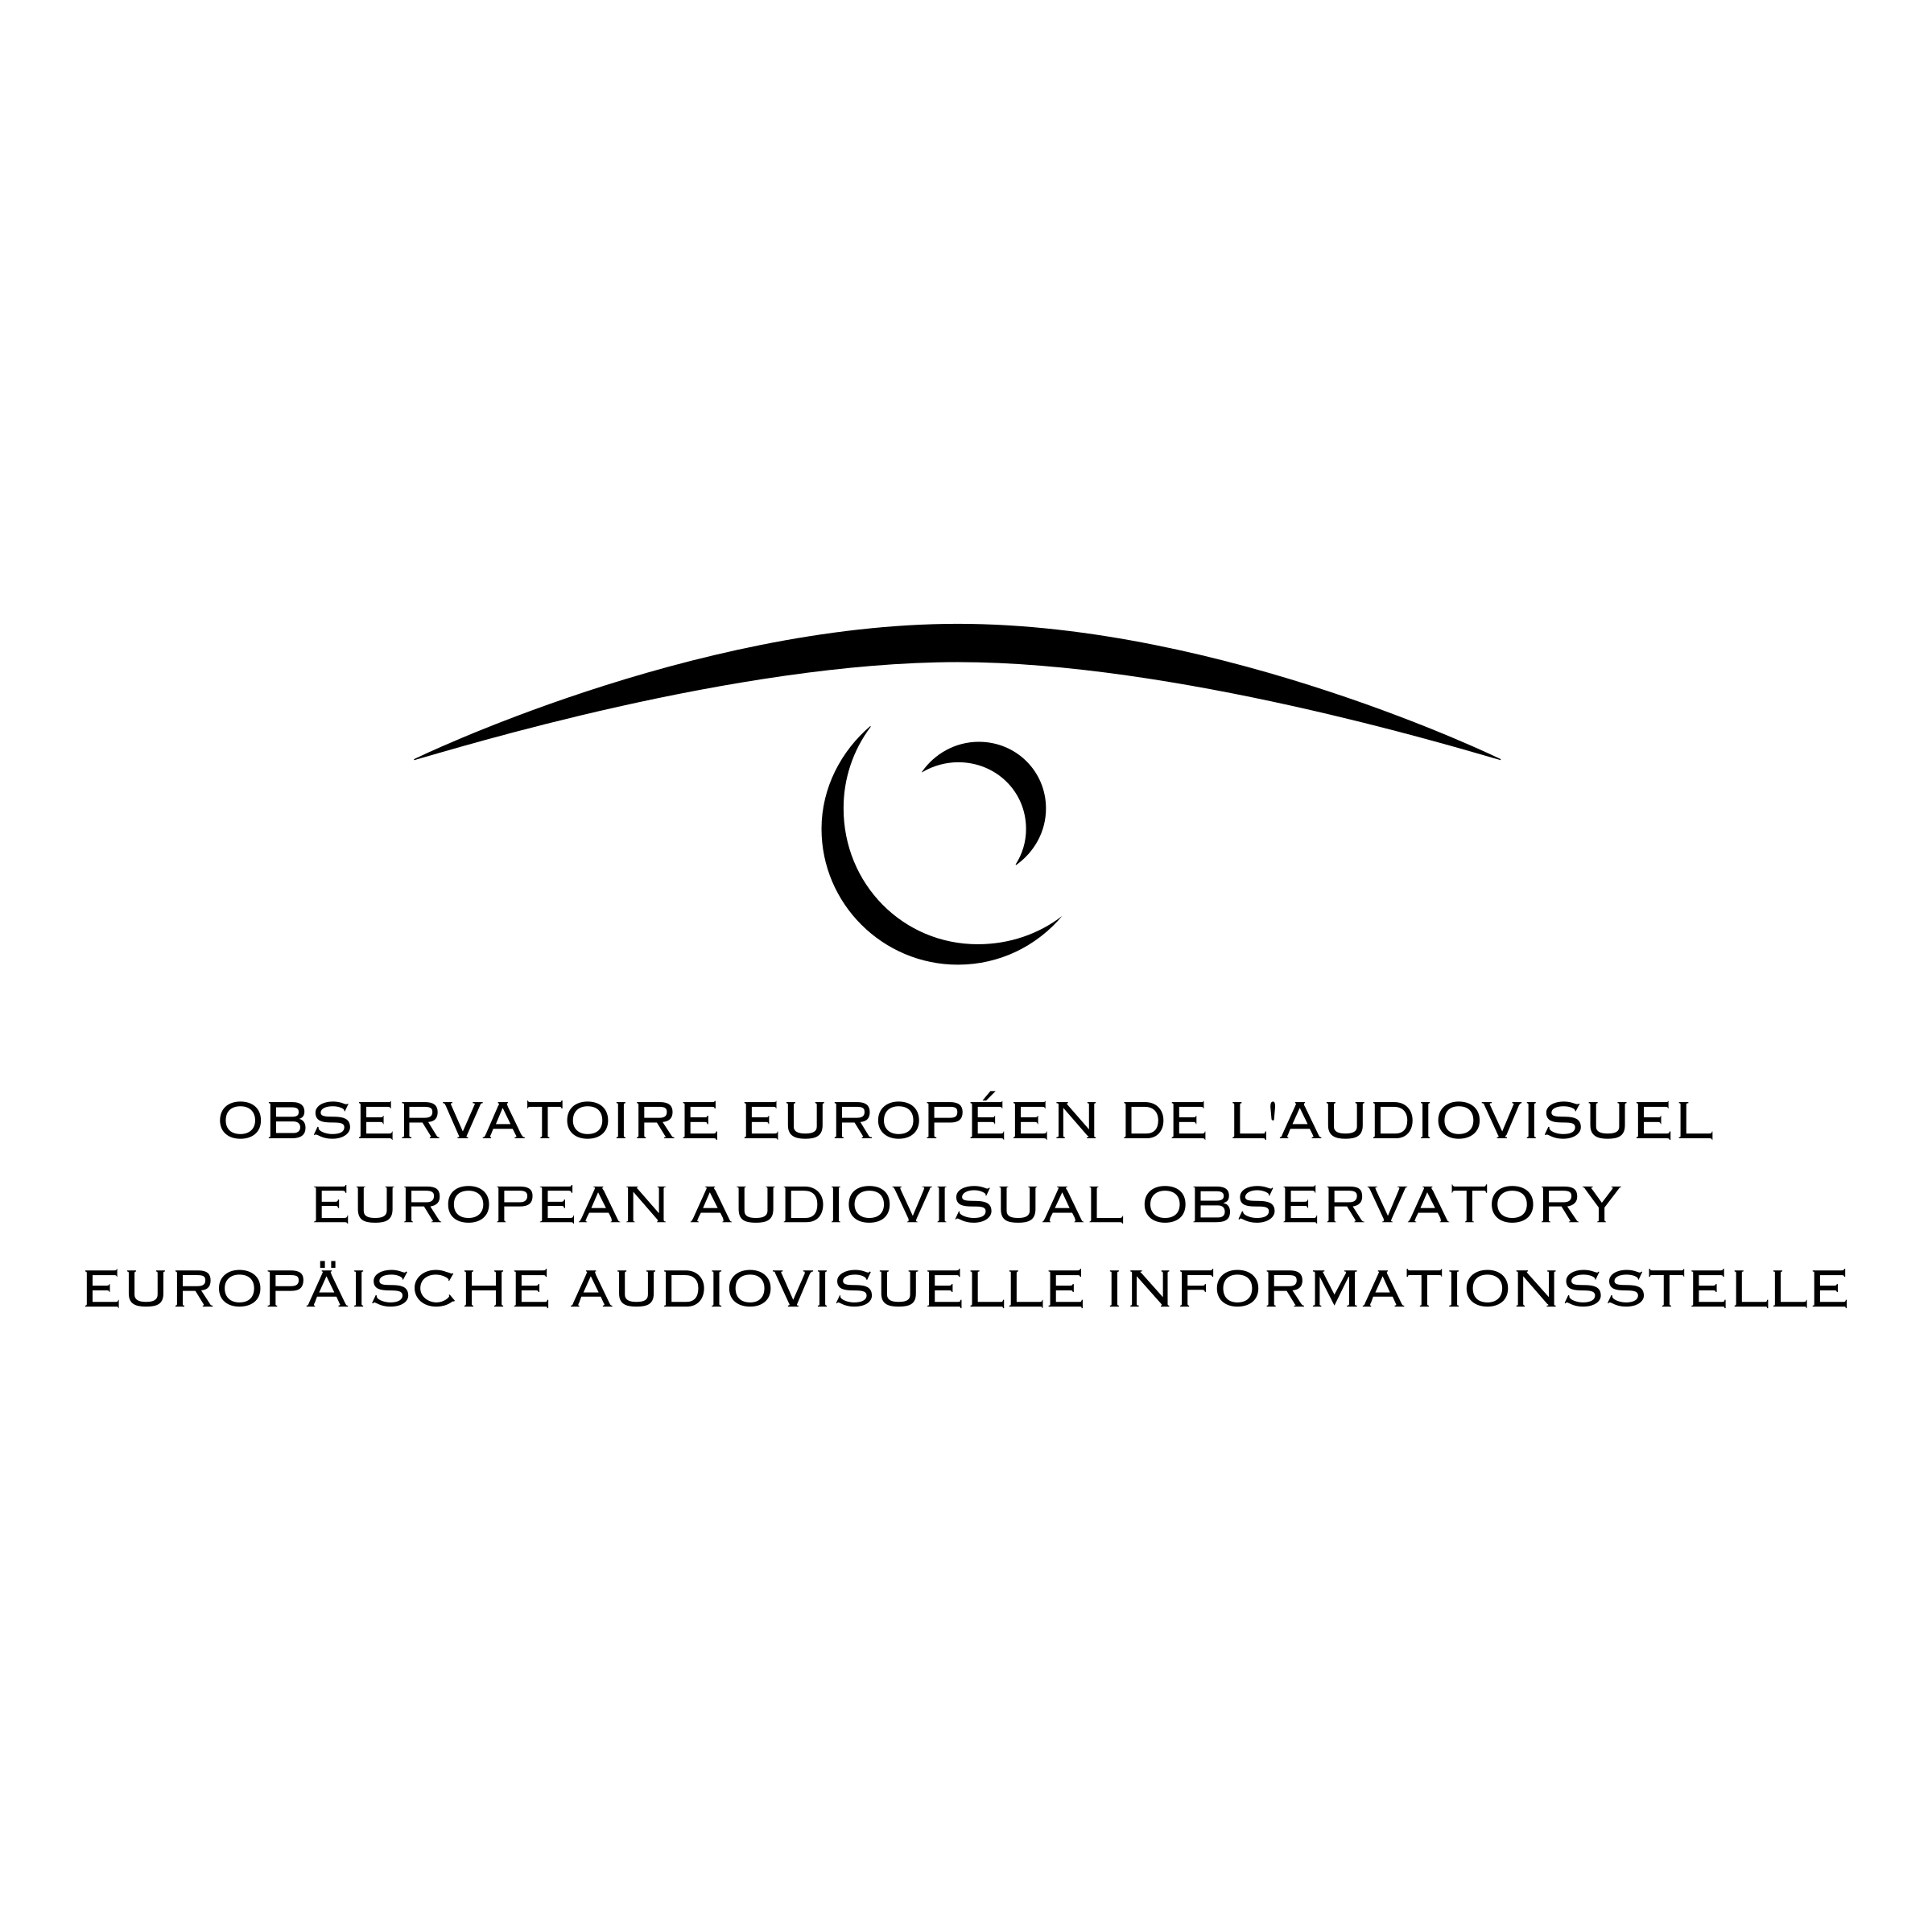 European Audiovisual Observatory Logo Png Transparent Svg Vector